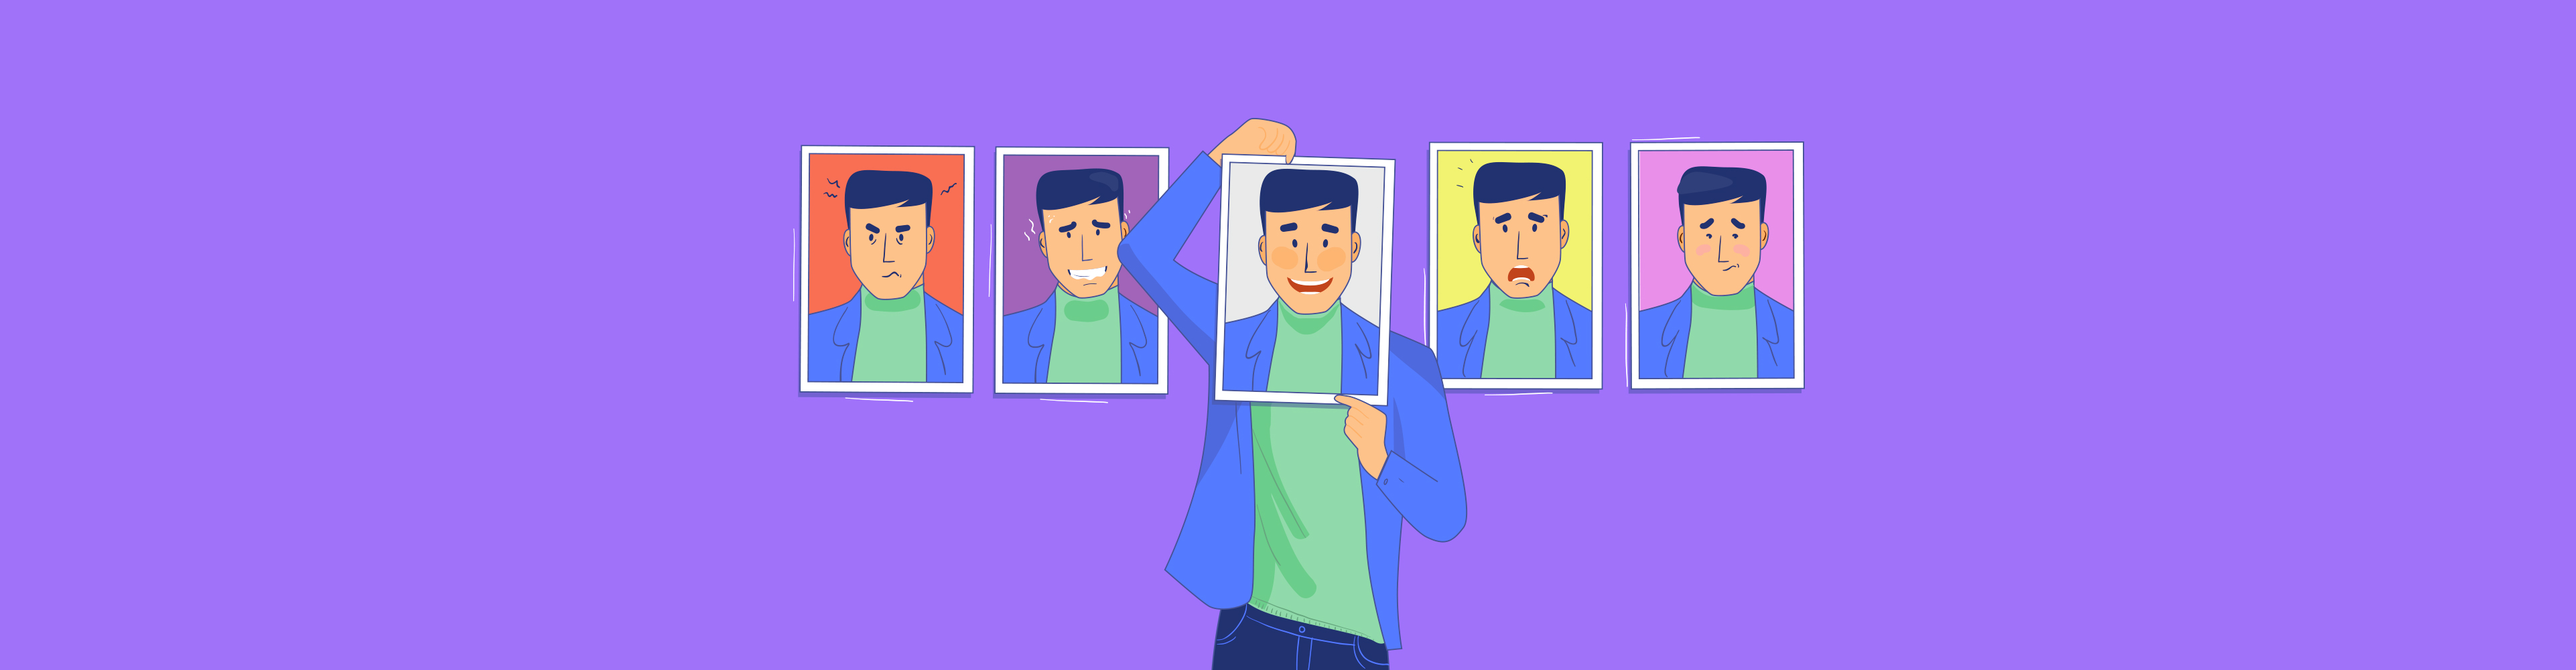 first impressions 5 ways Presenterscan make a great first impression-header